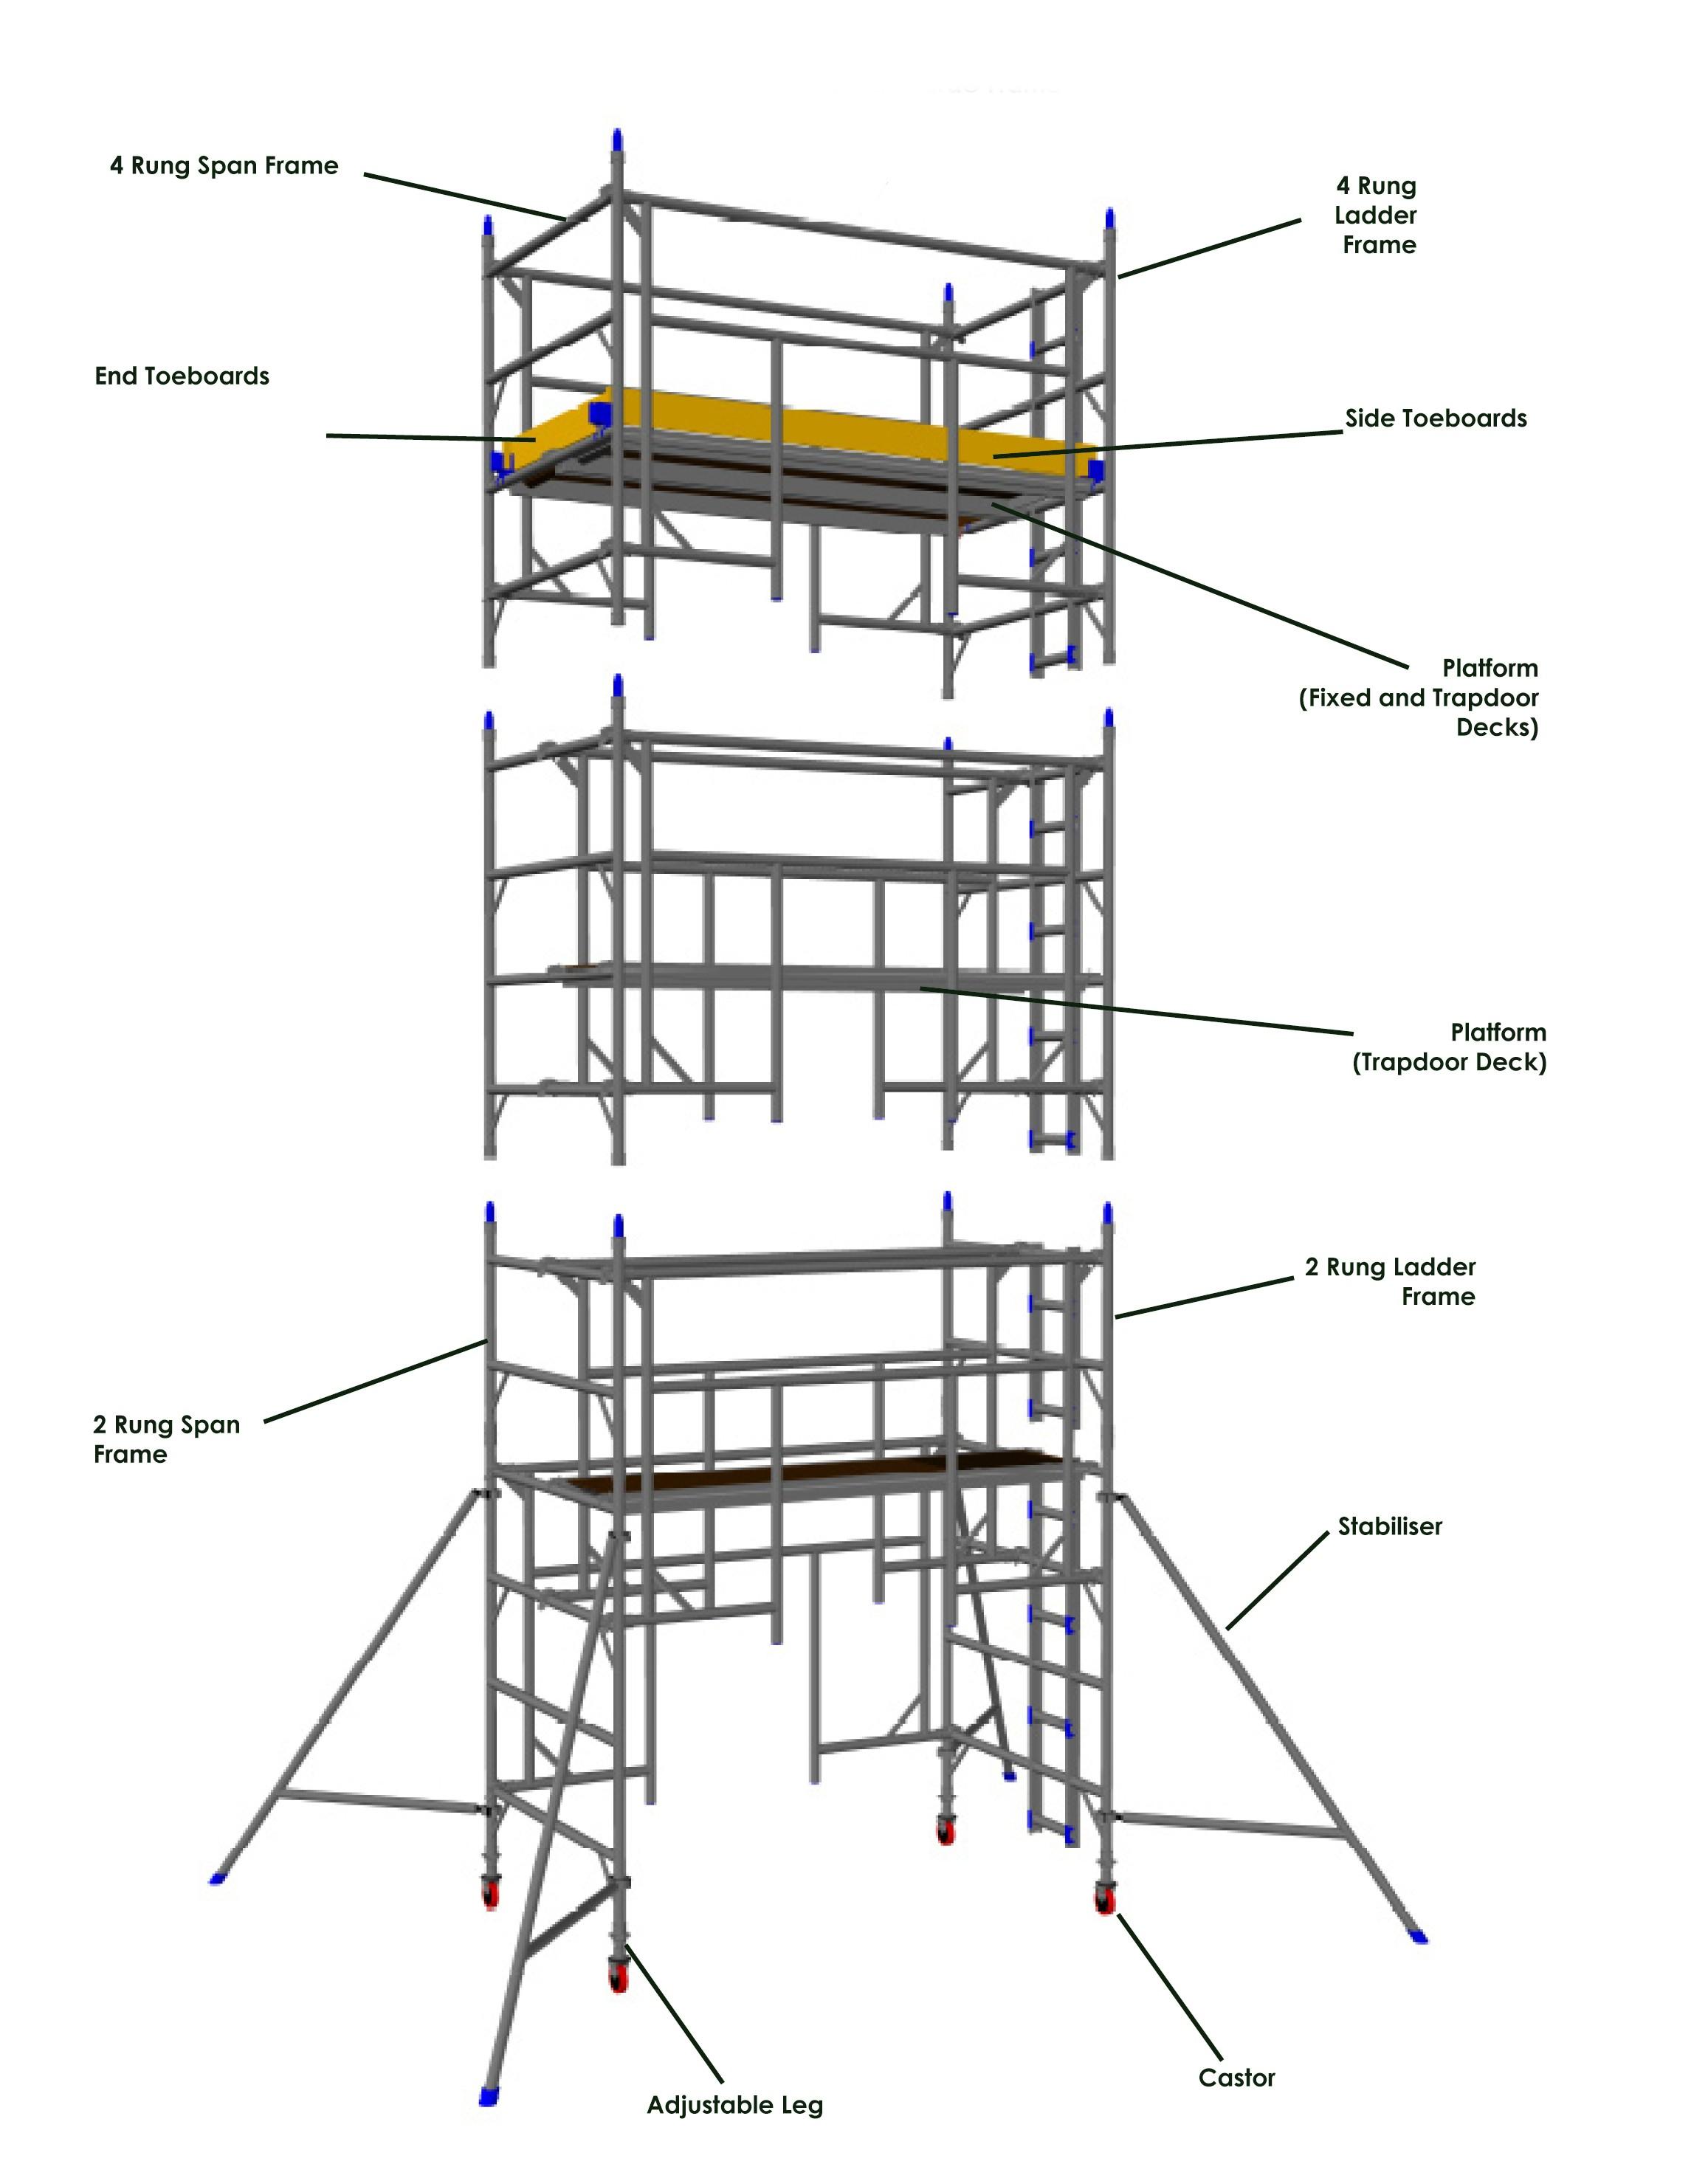 extension ladder parts diagram 240v thermostat wiring werner circuit maker